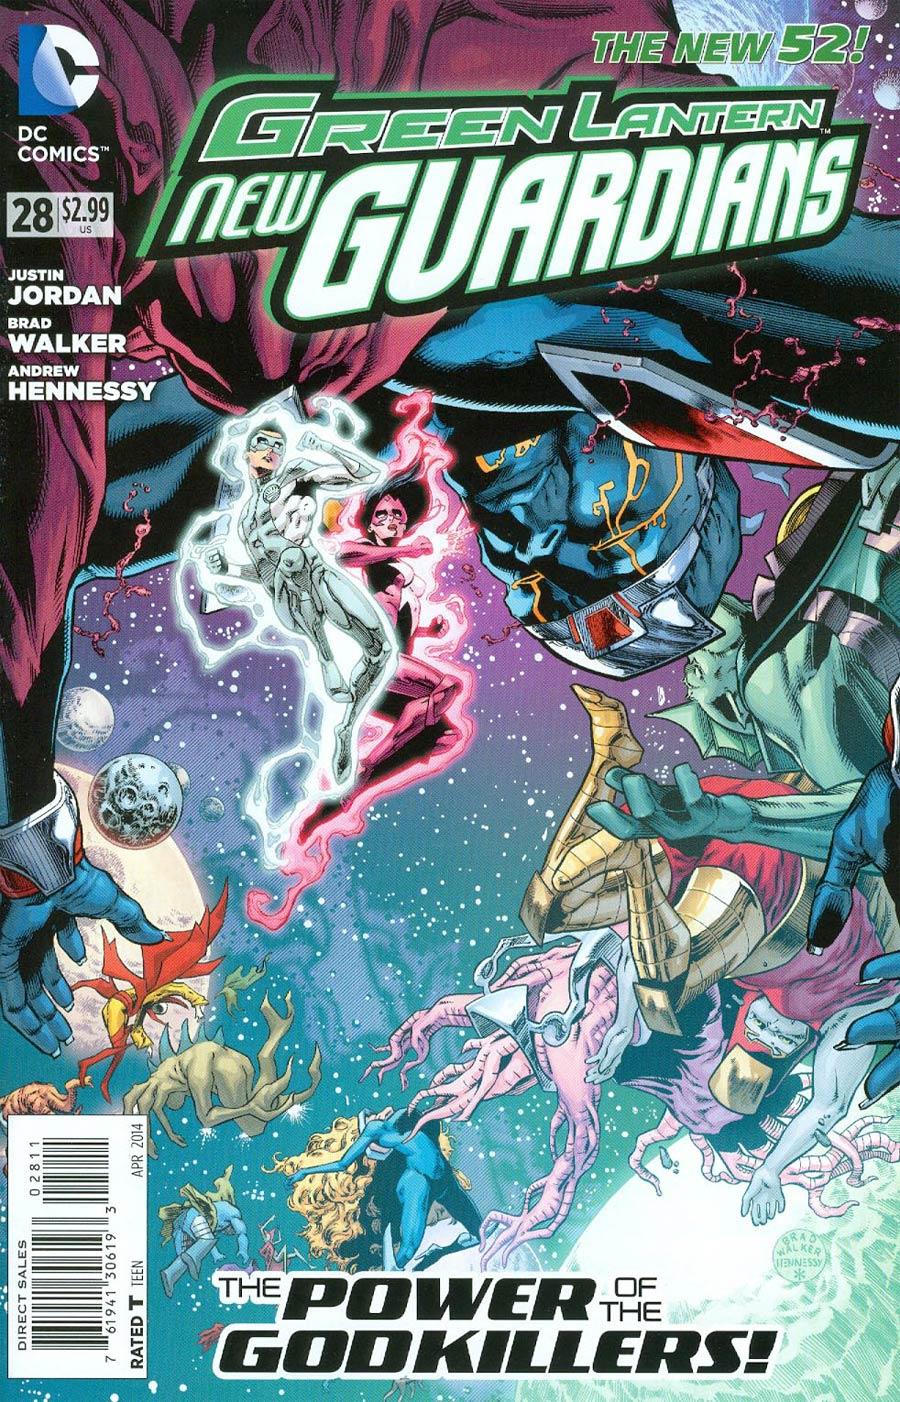 Green Lantern New Guardians #28 Cover A Regular Brad Walker Cover